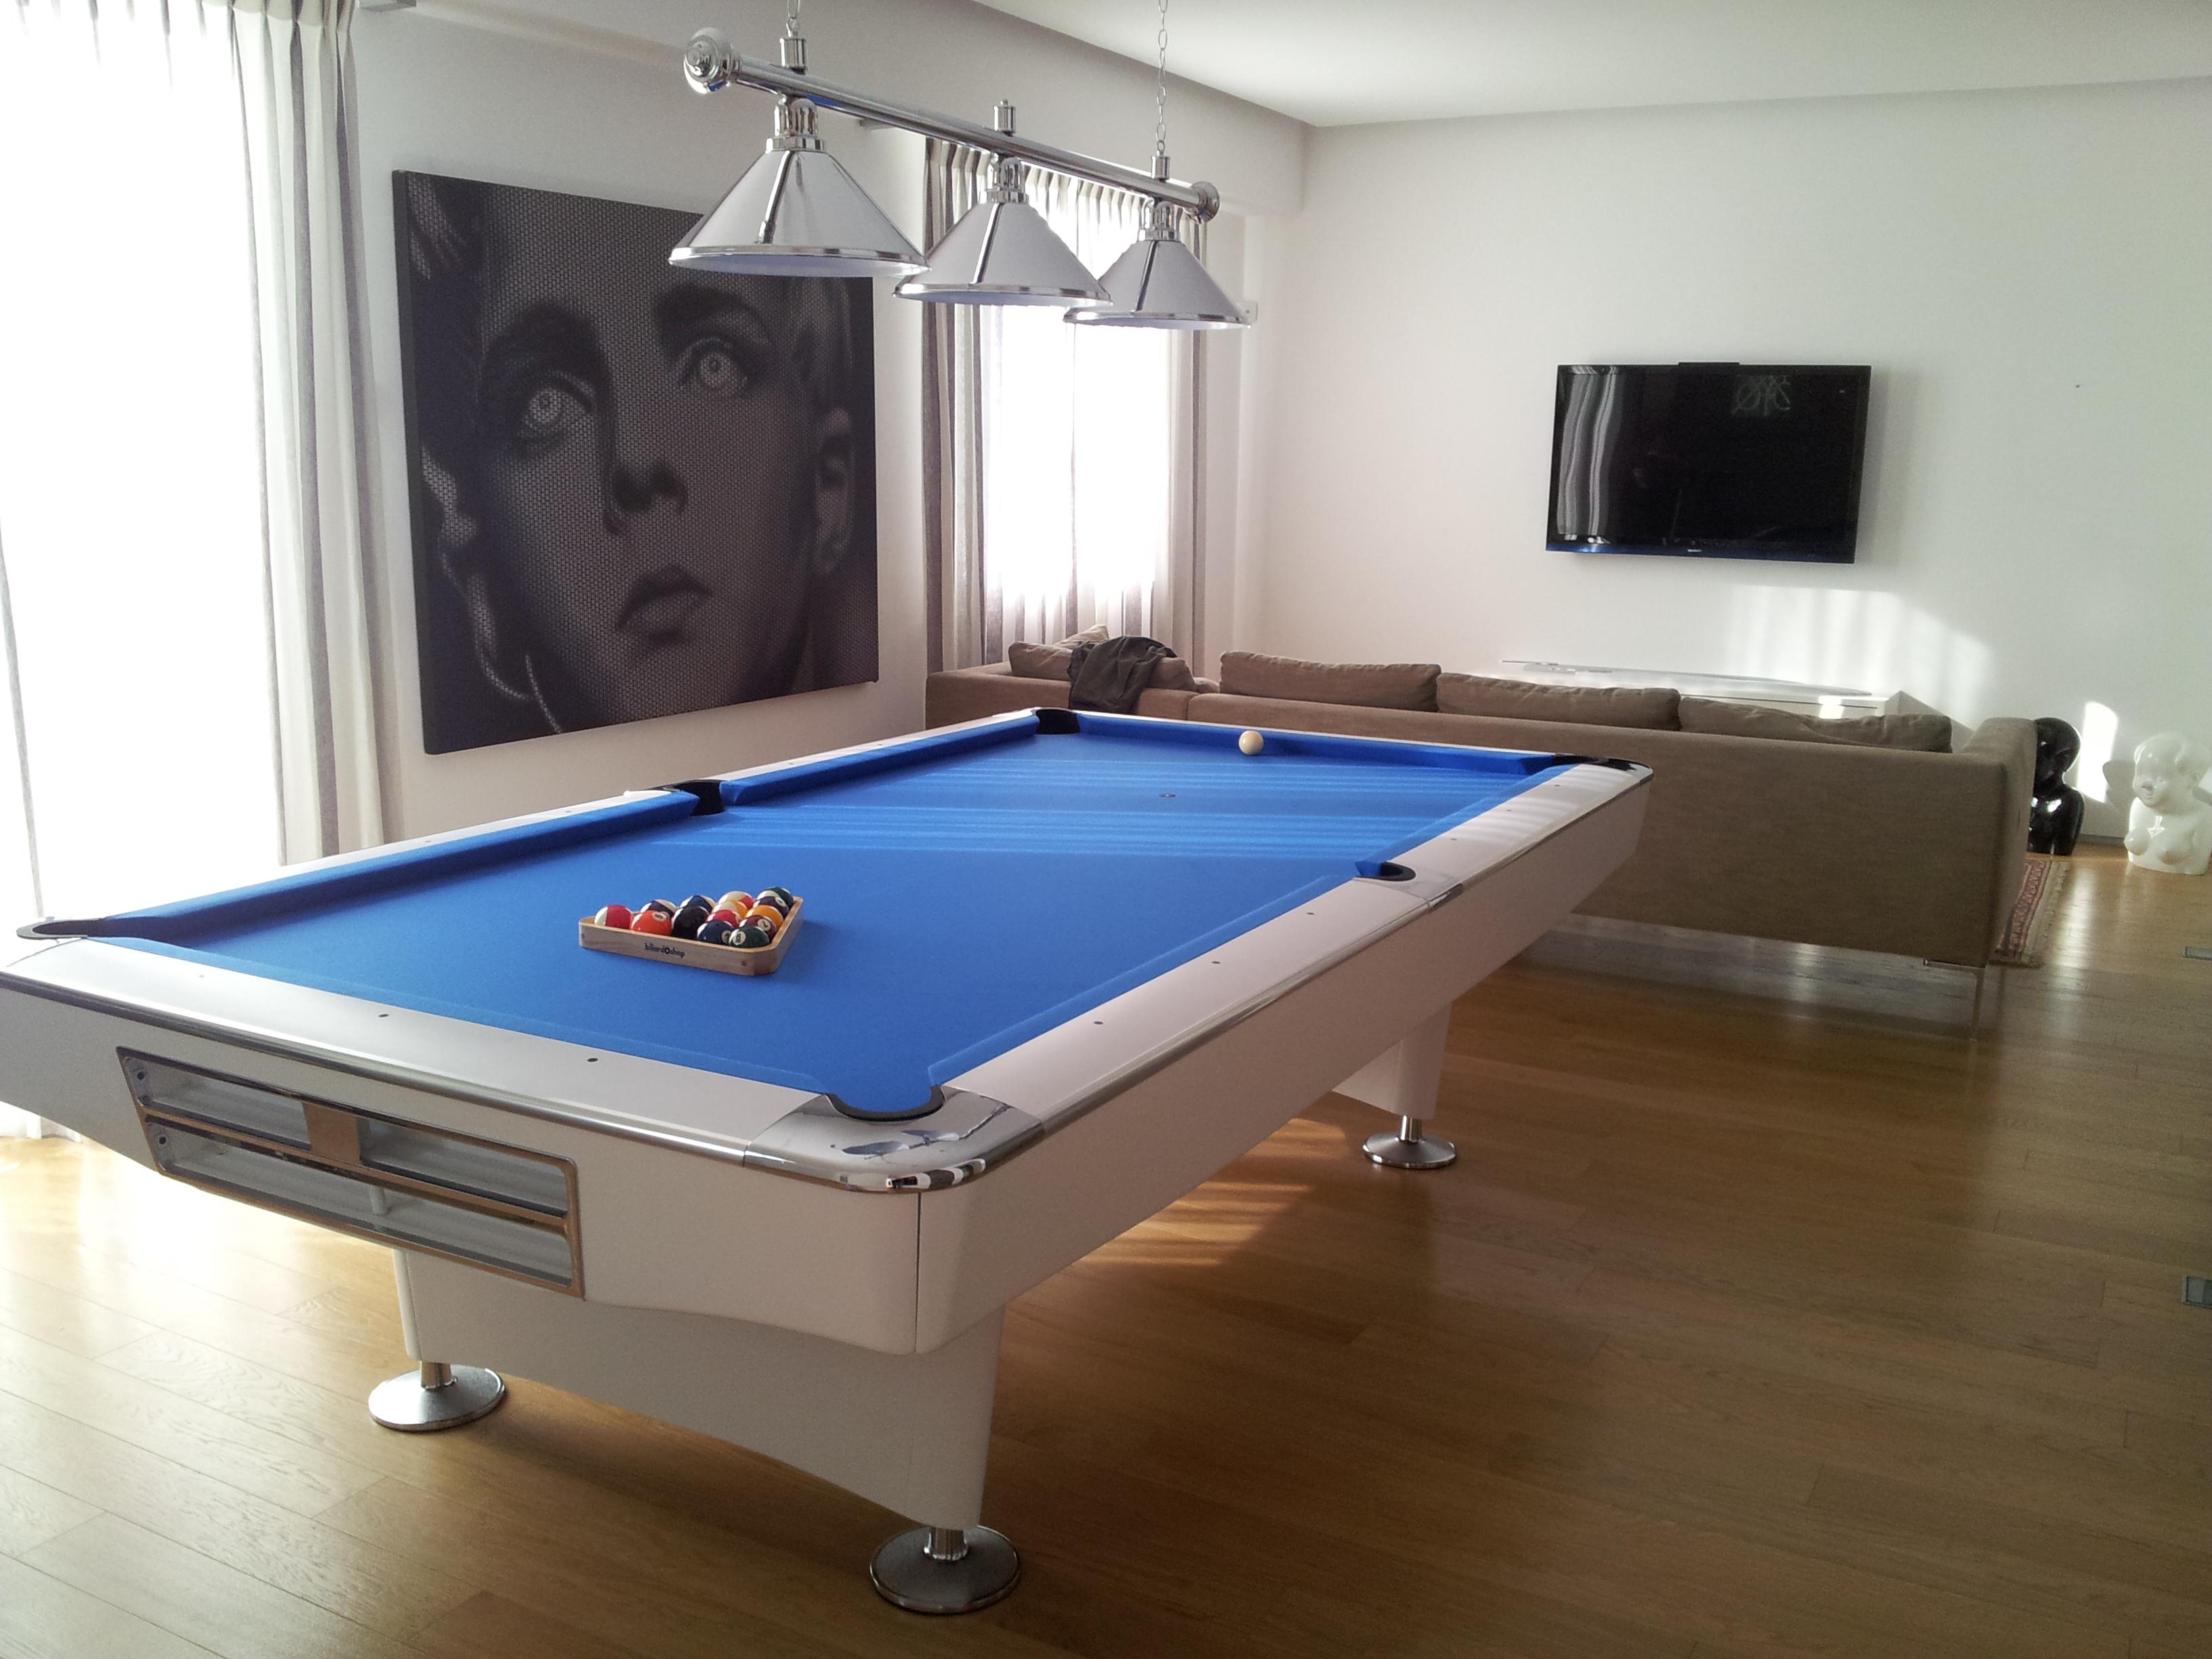 Biliardo pool Prolive Bianco 9 piedi